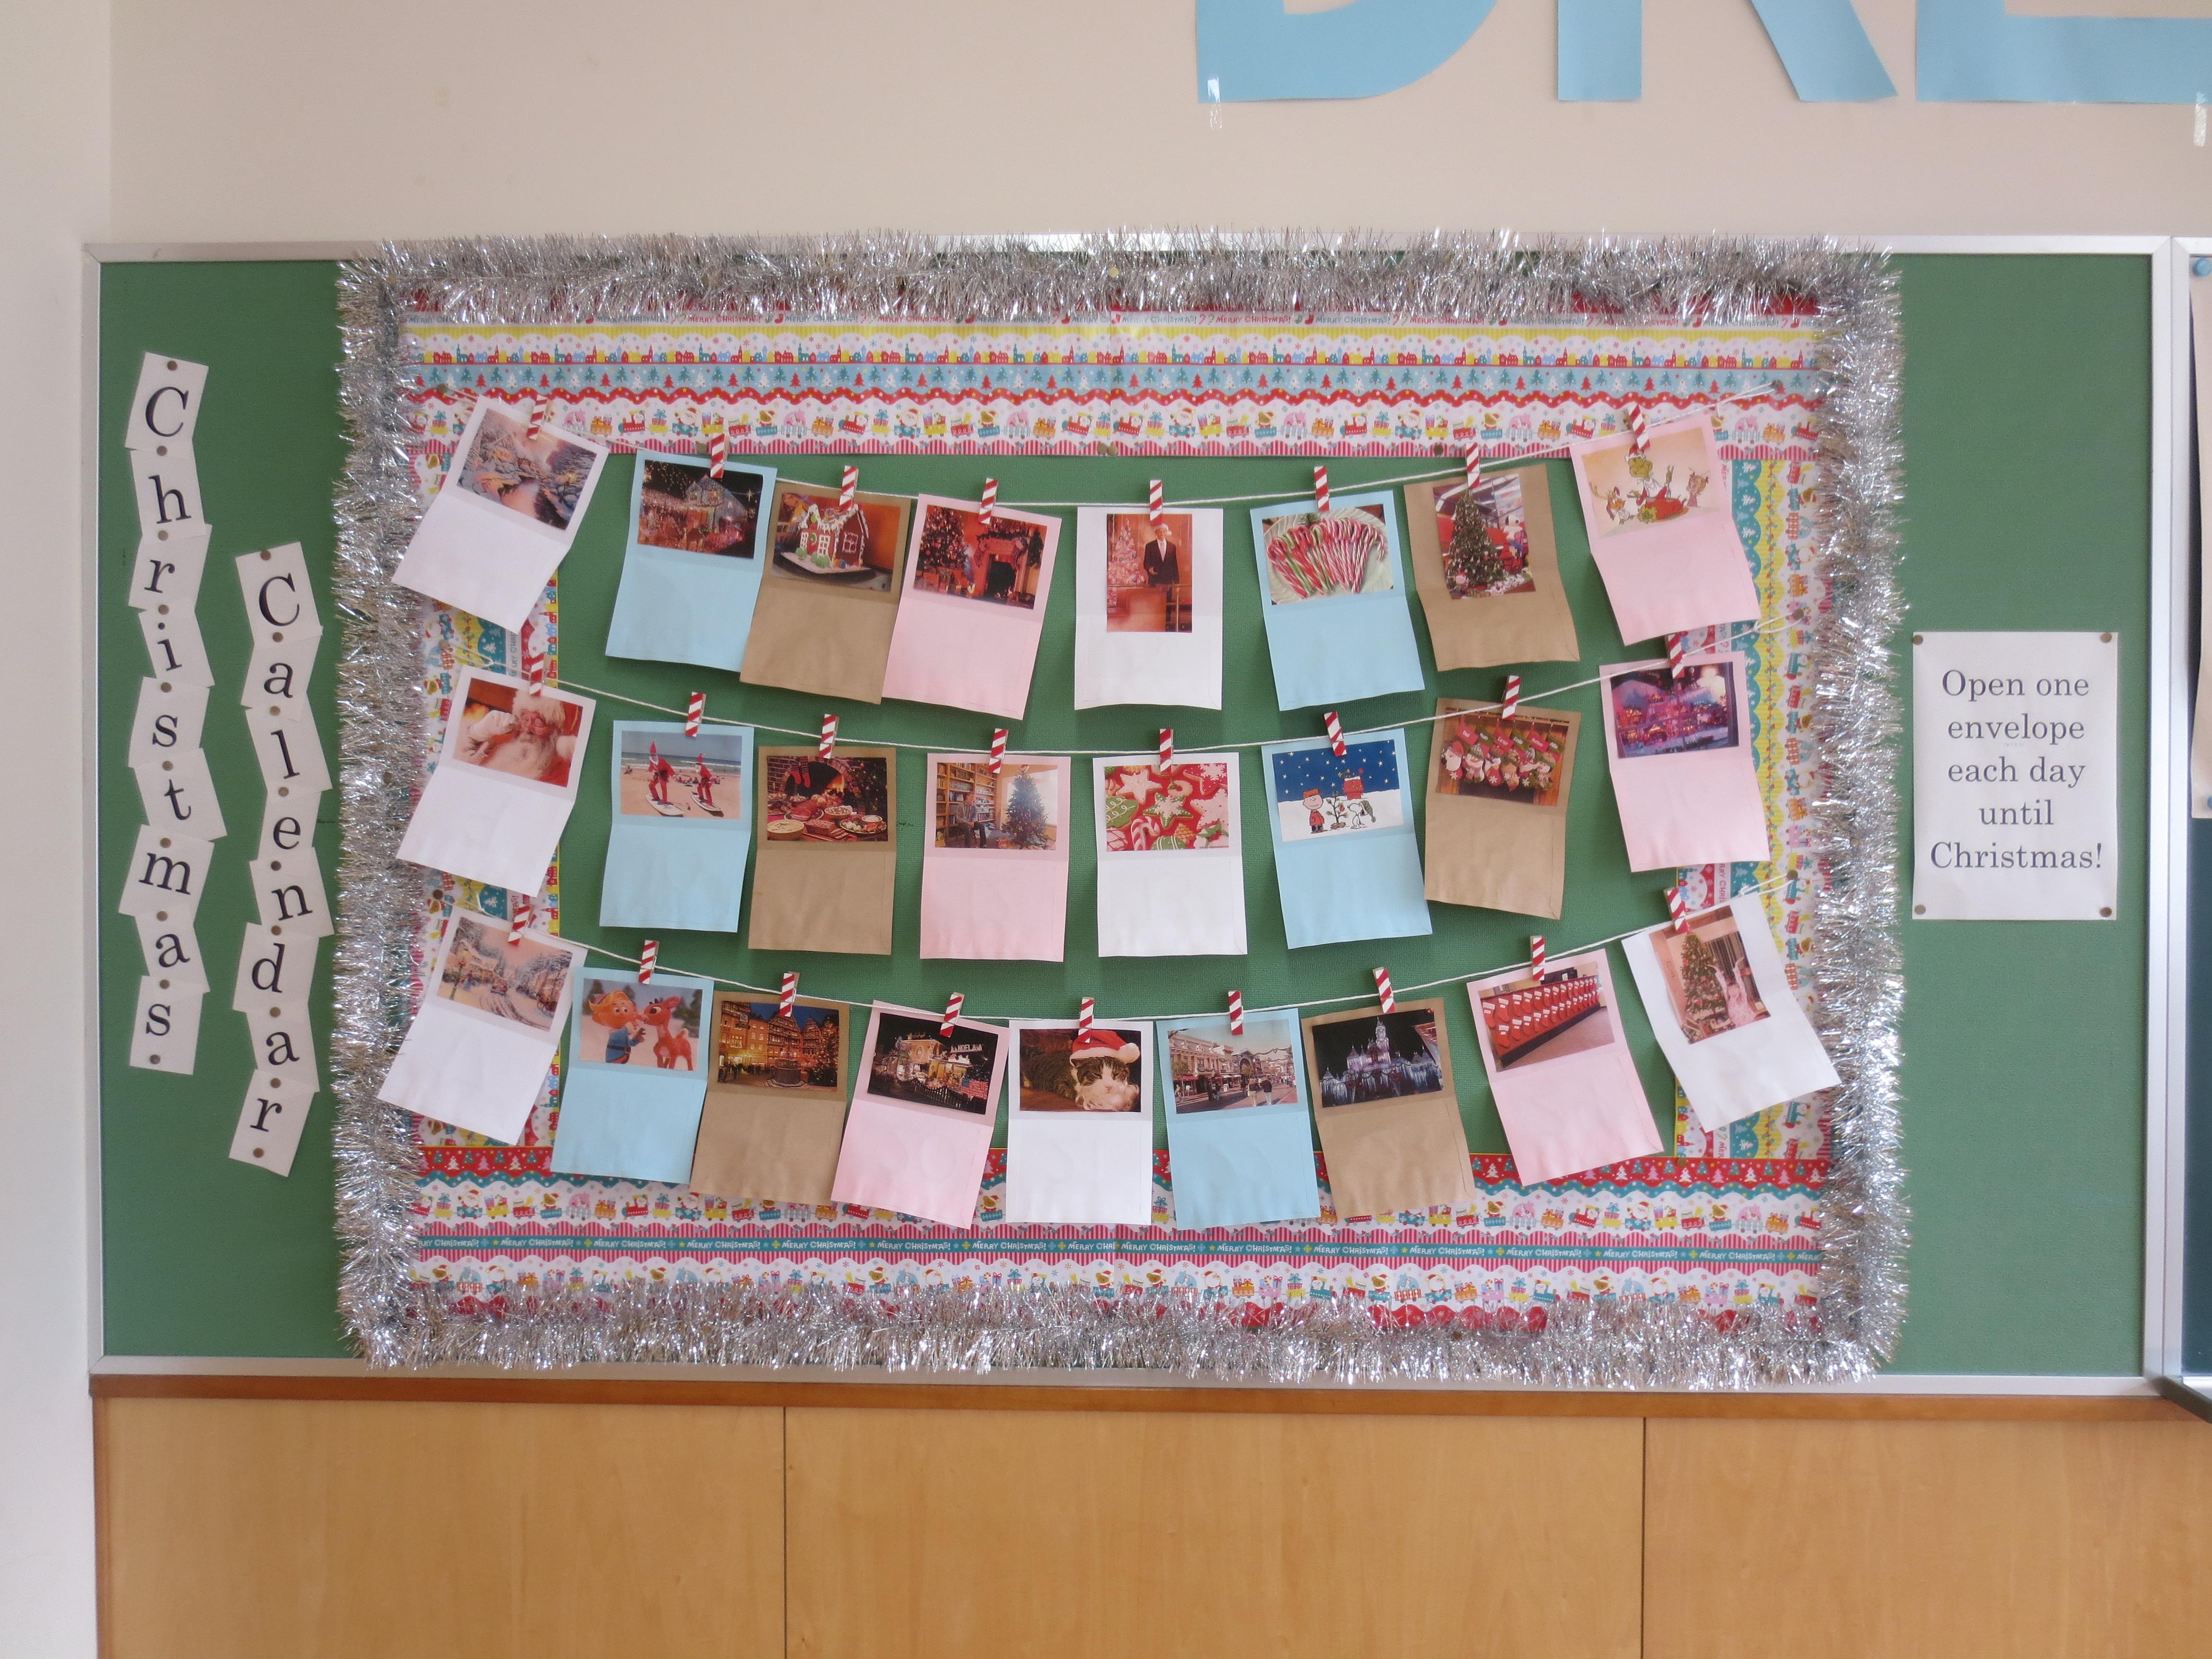 Calendar Bulletin Board Ideas Middle School : Christmas bulletin board advent calendar 素敵なライフ